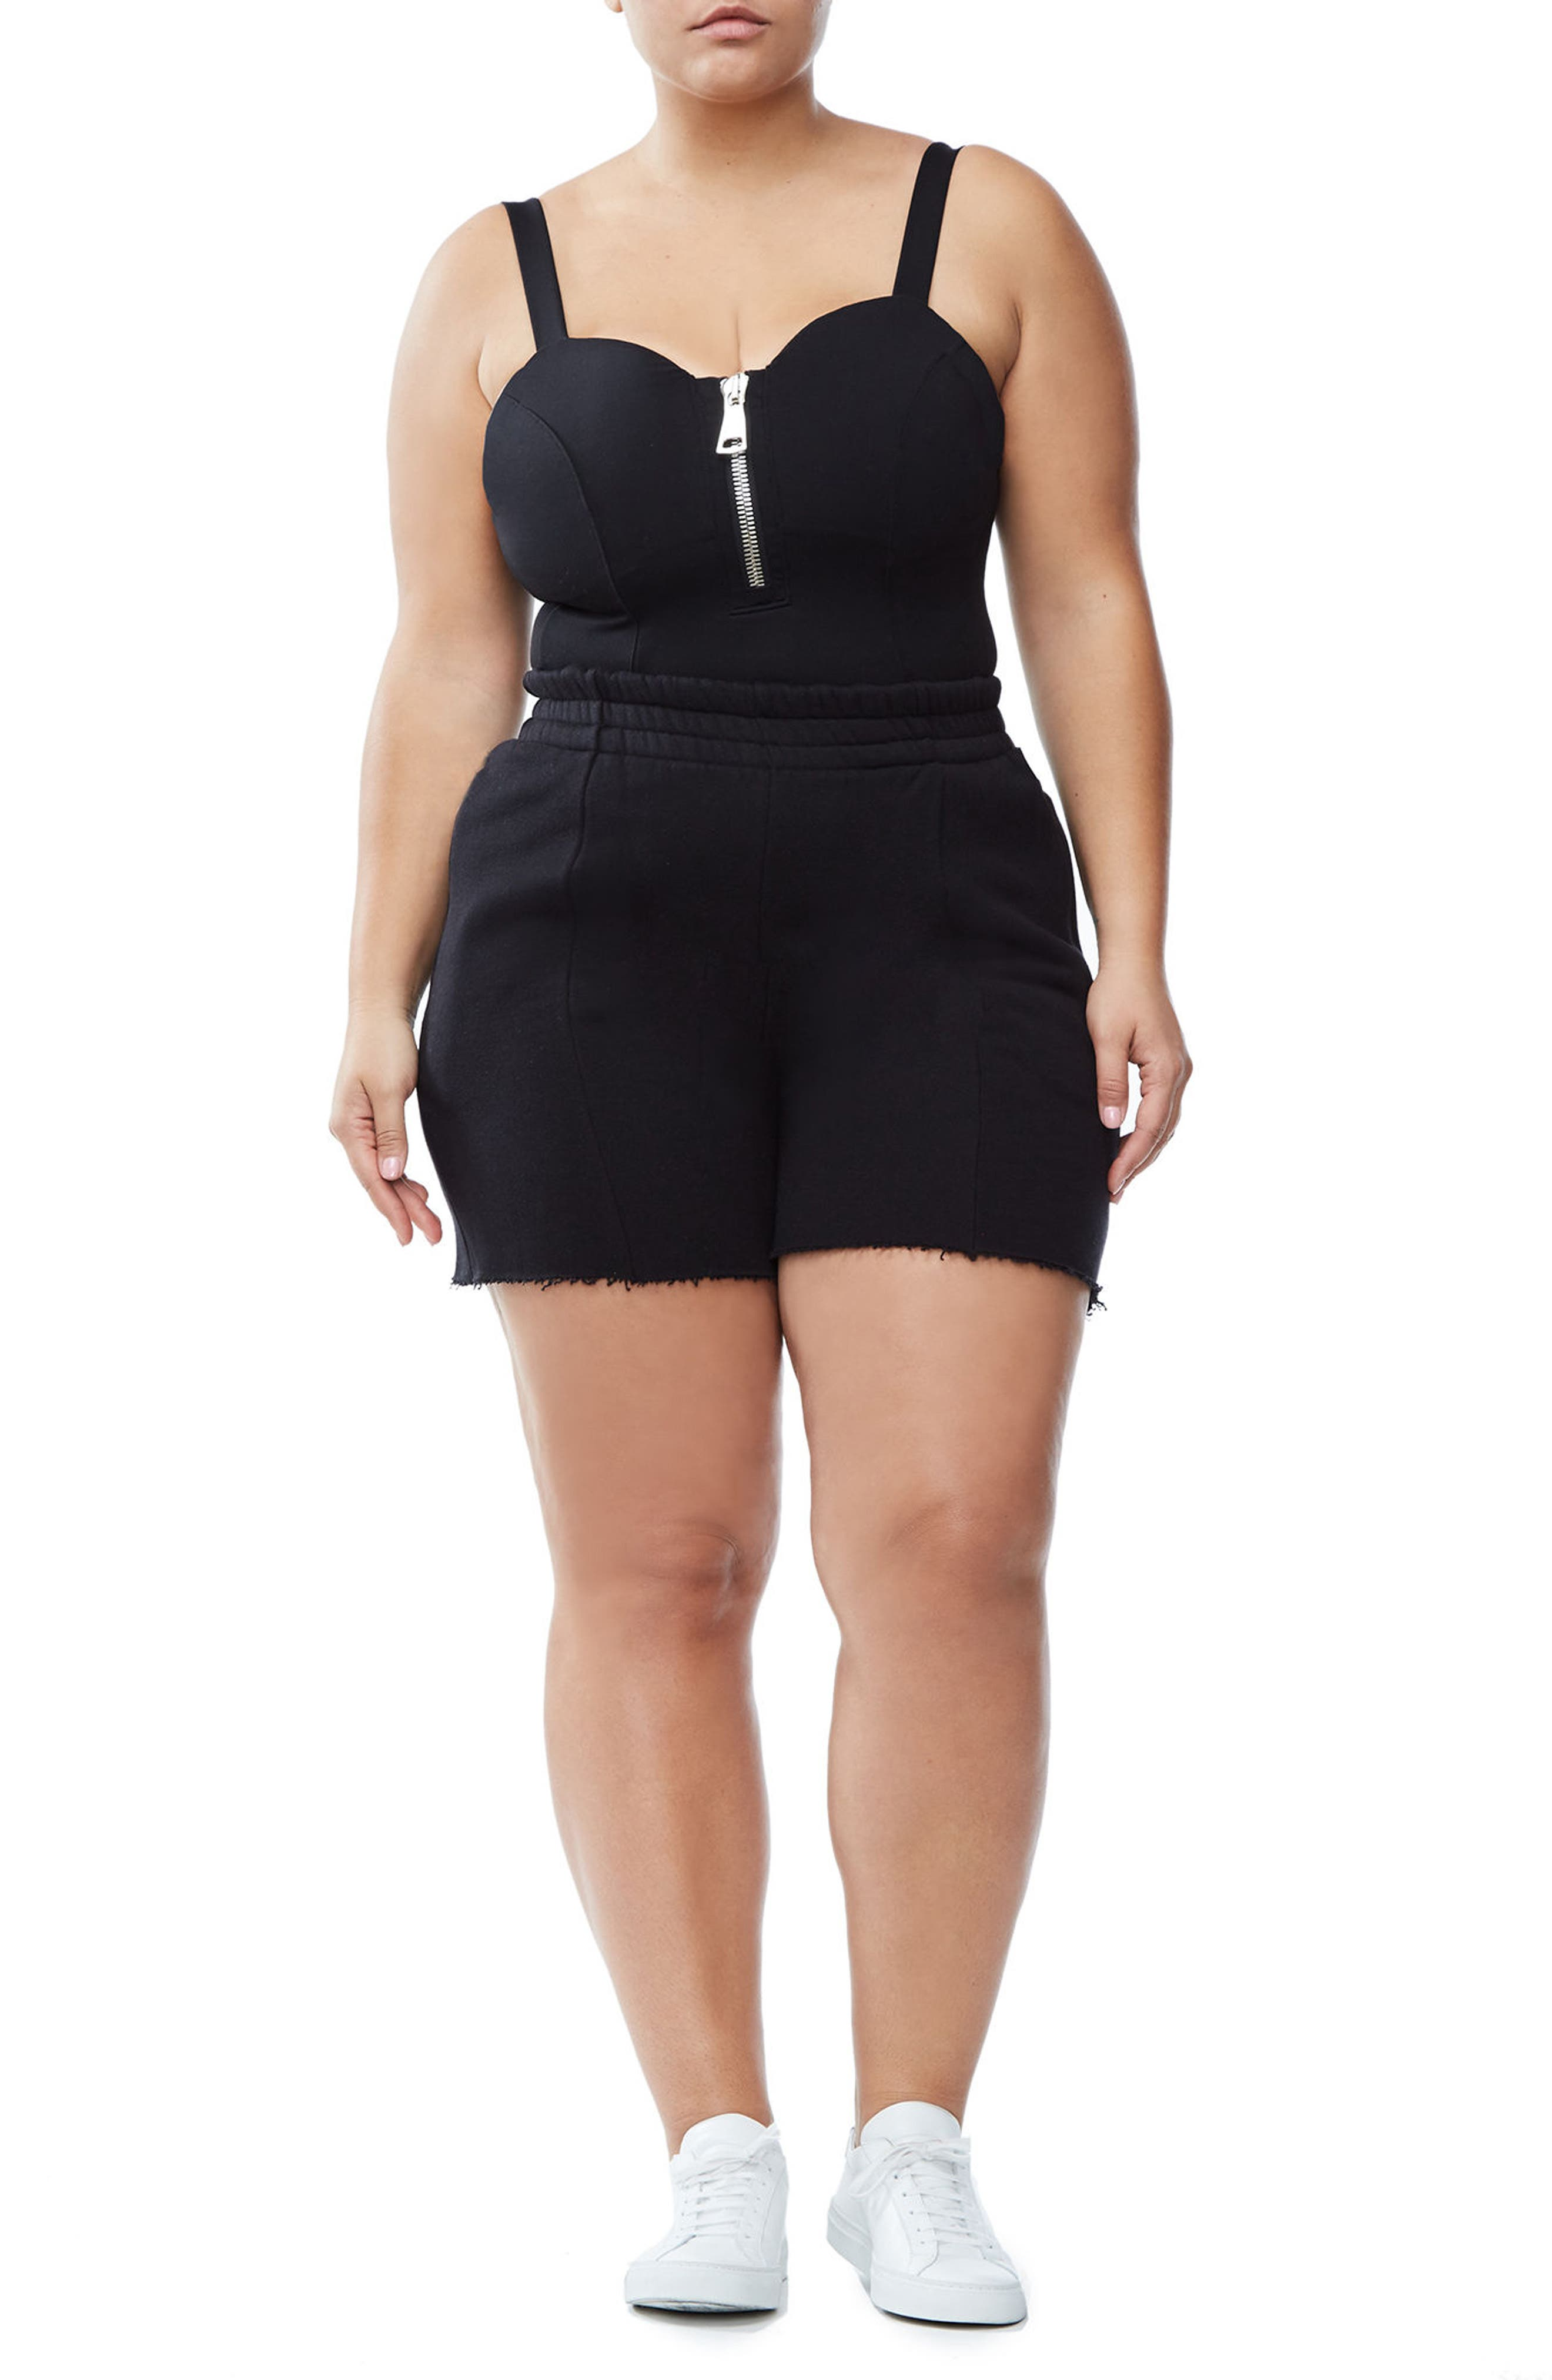 Good Sweats The High Waist Shorts,                             Alternate thumbnail 4, color,                             002